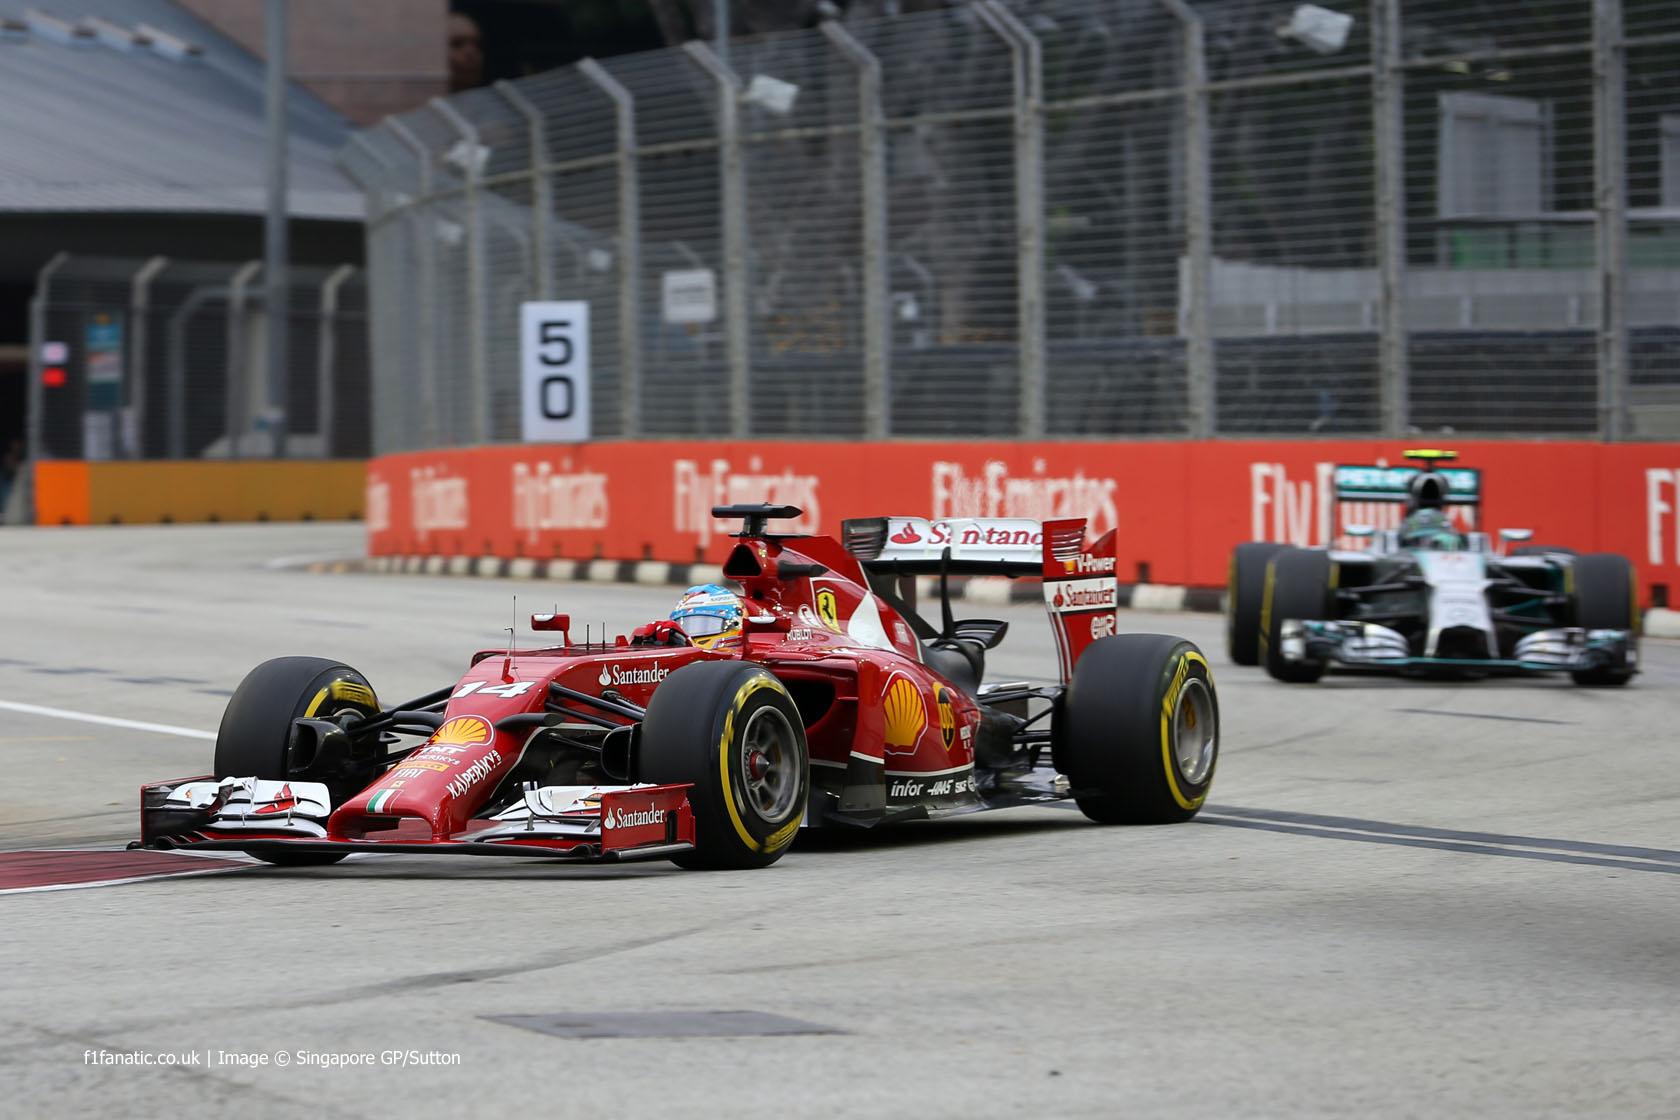 Fernando Alonso, Ferrari, Singapore, 2014